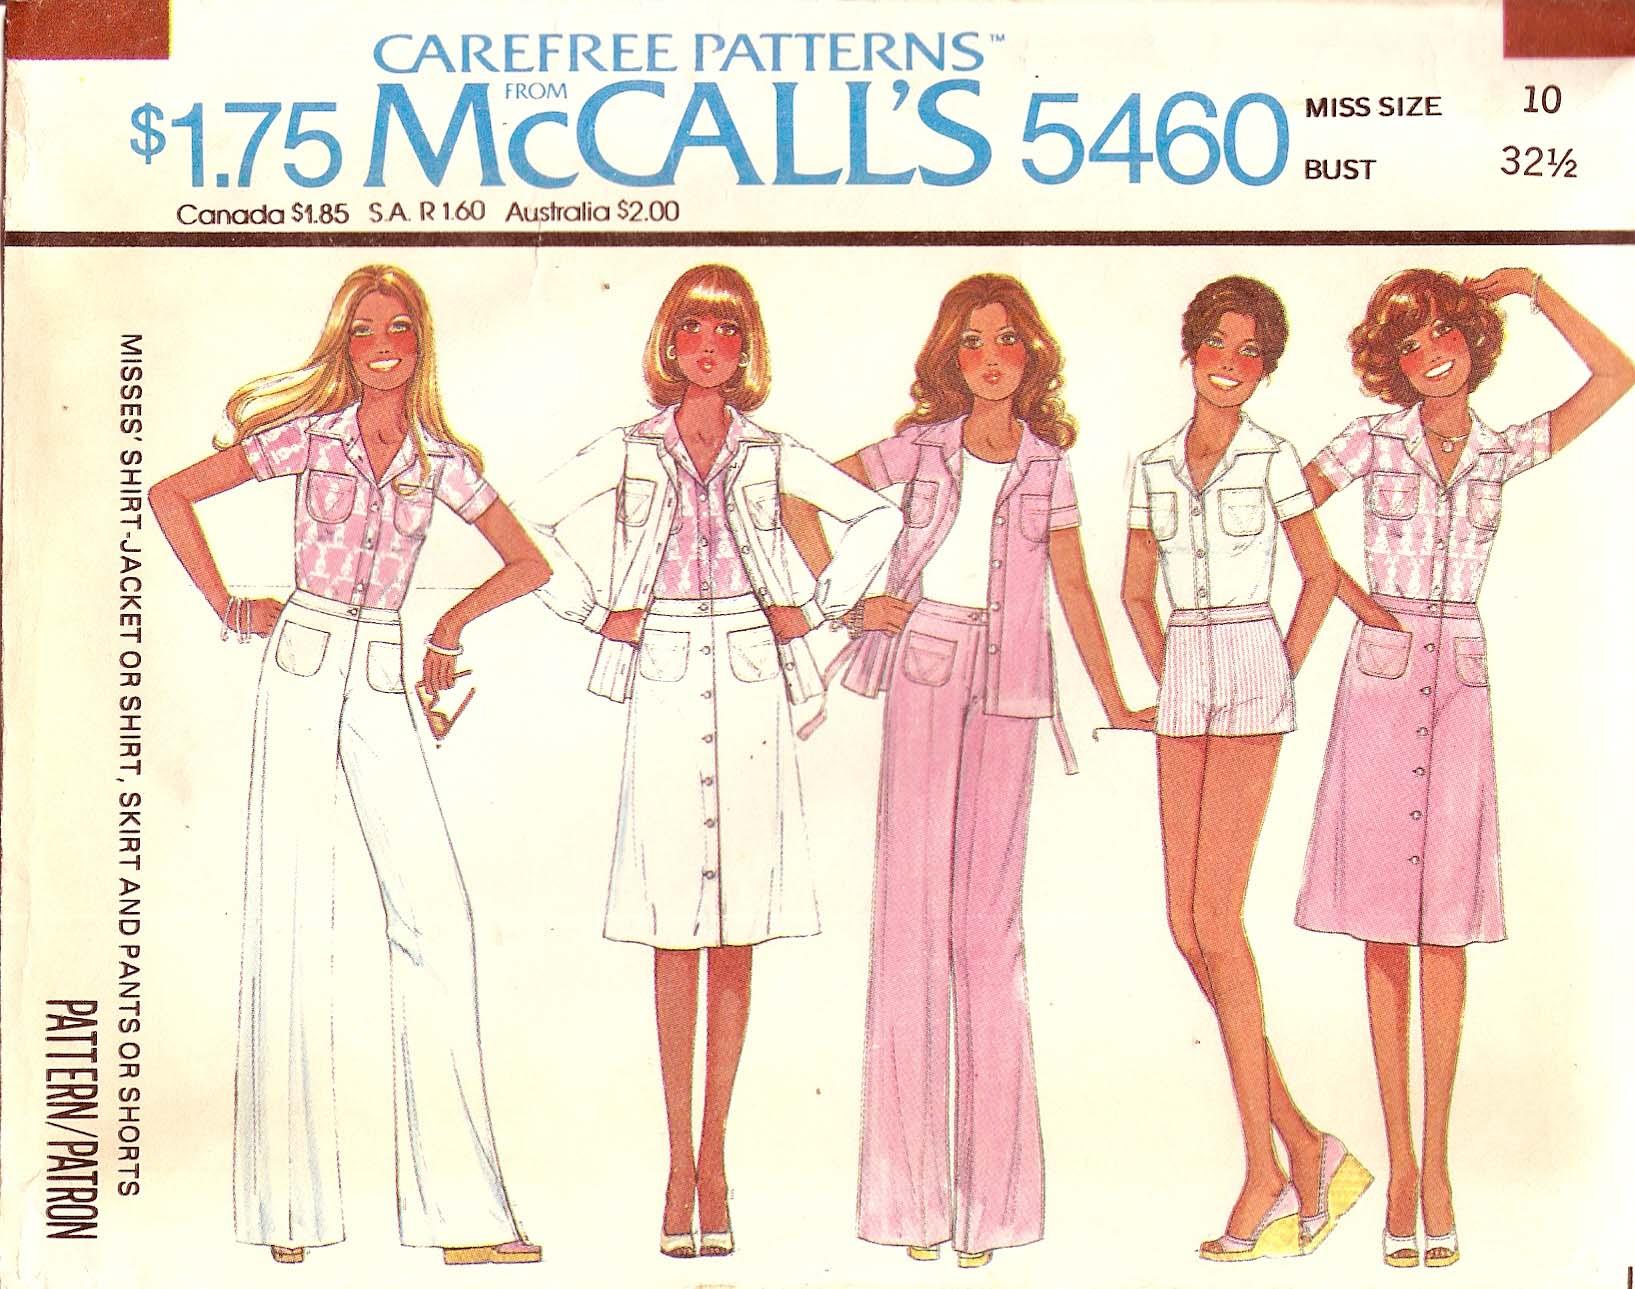 McCall's 5460 A